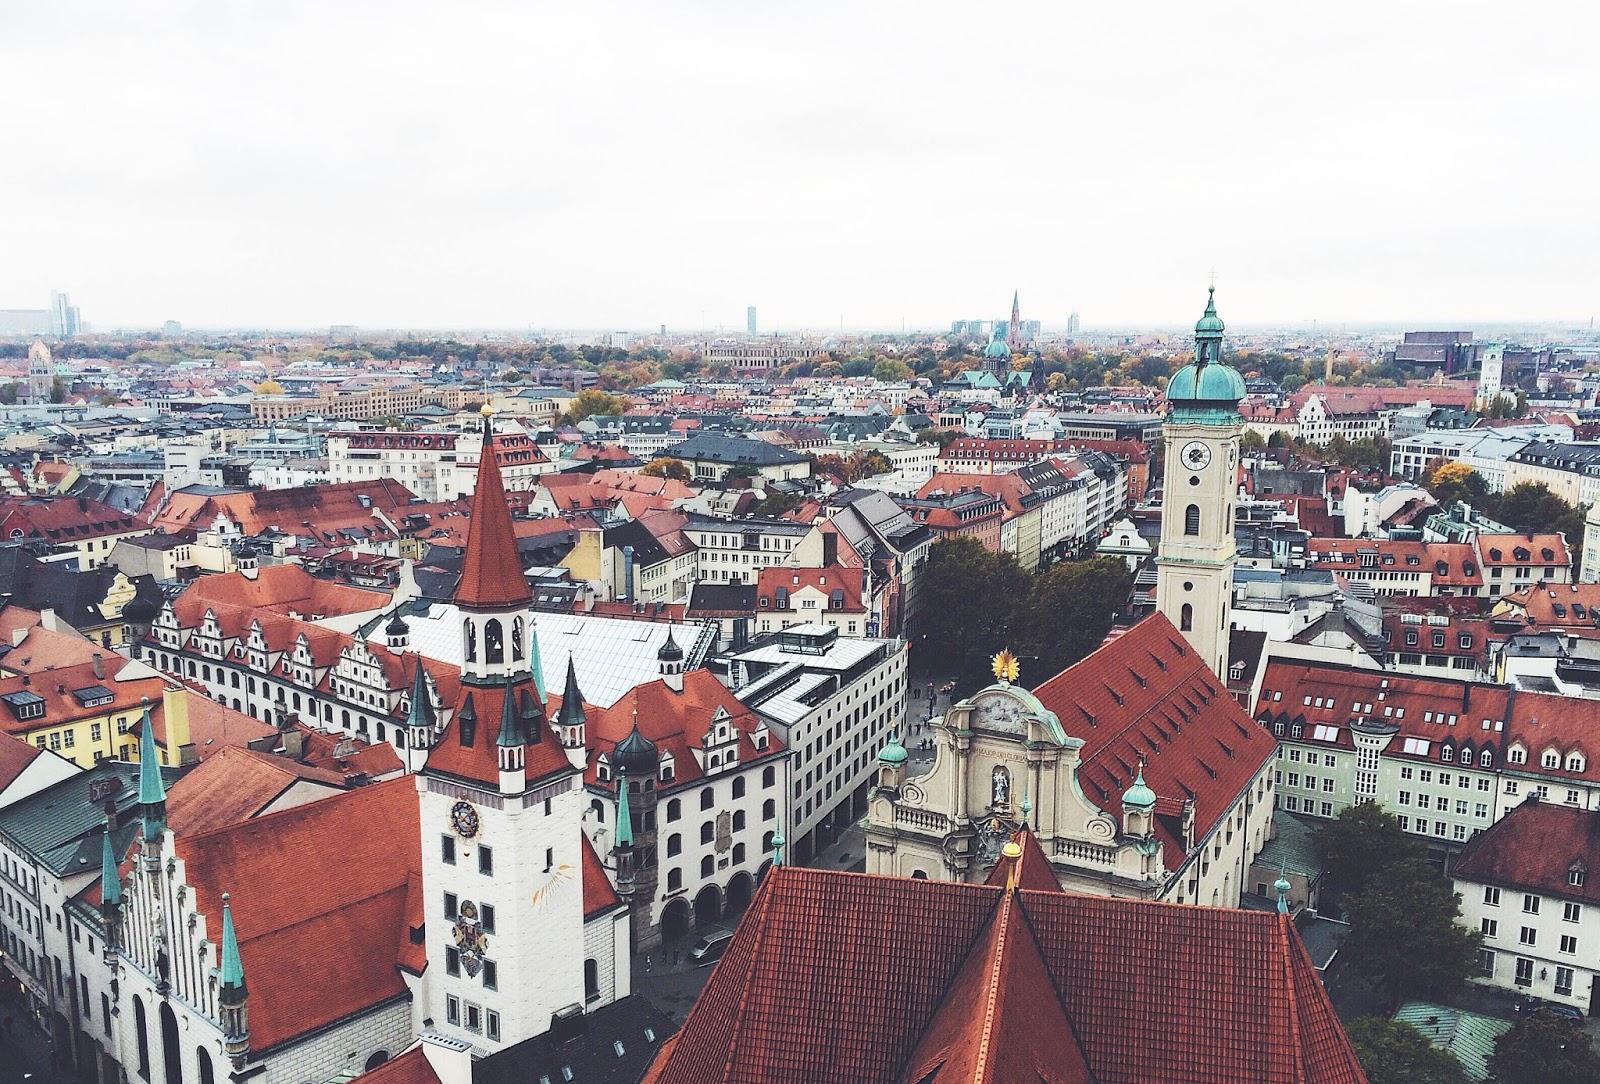 munich bayern germany city view from saint peter church